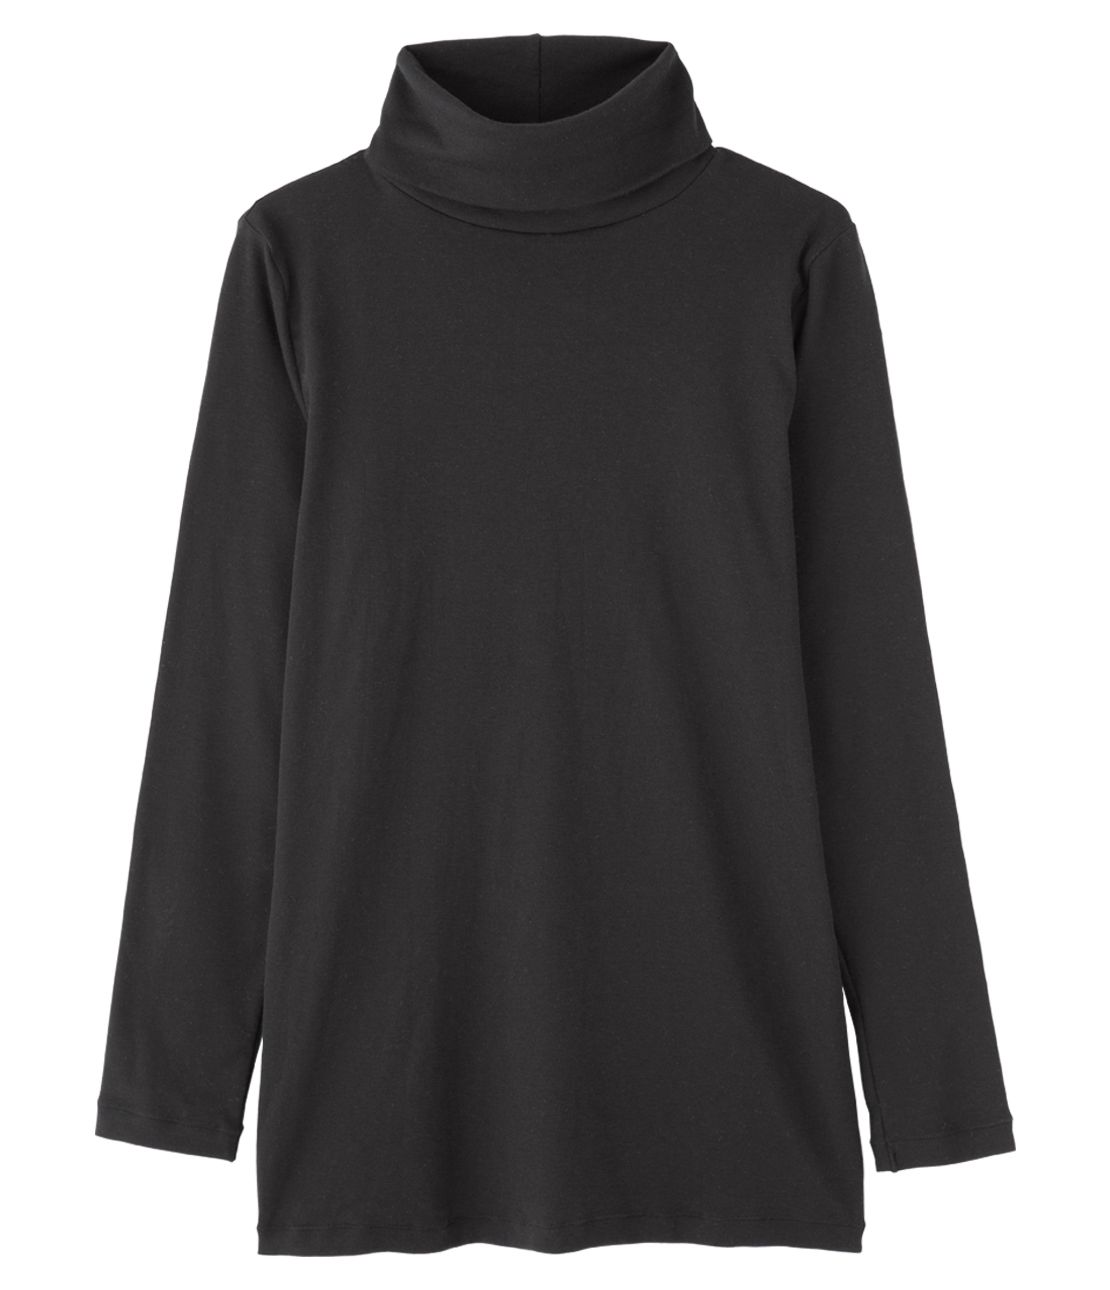 Cotton silk turtleneck long-sleeved